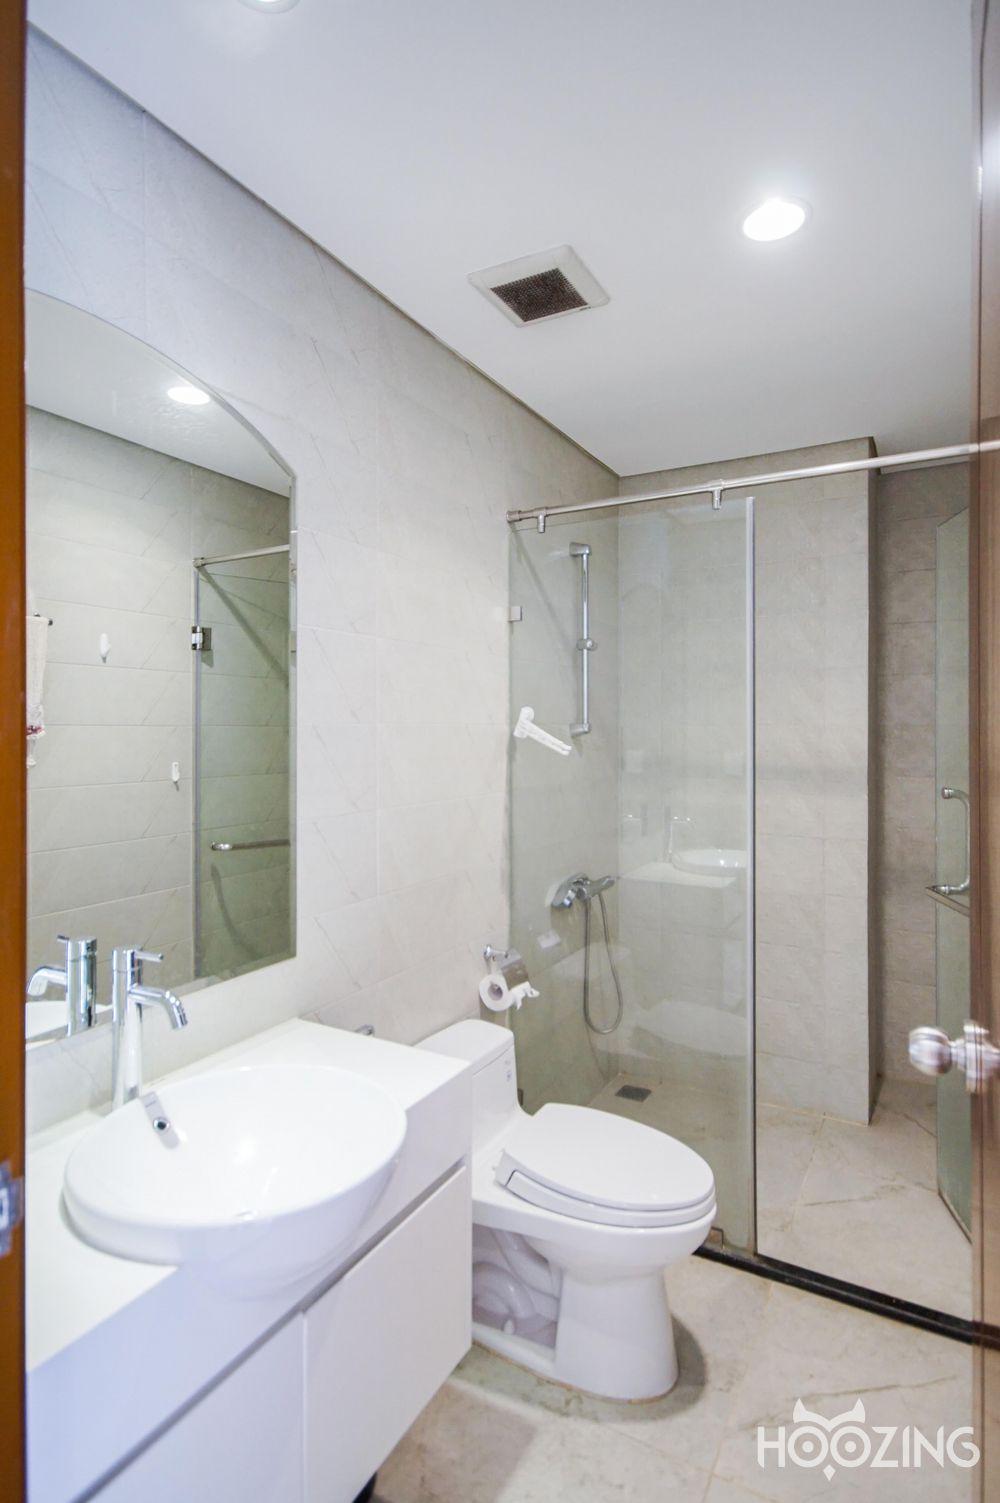 Vinhomes Central Park Office-tel Apartment 1 Bedroom - Basic Furnished & Cozy